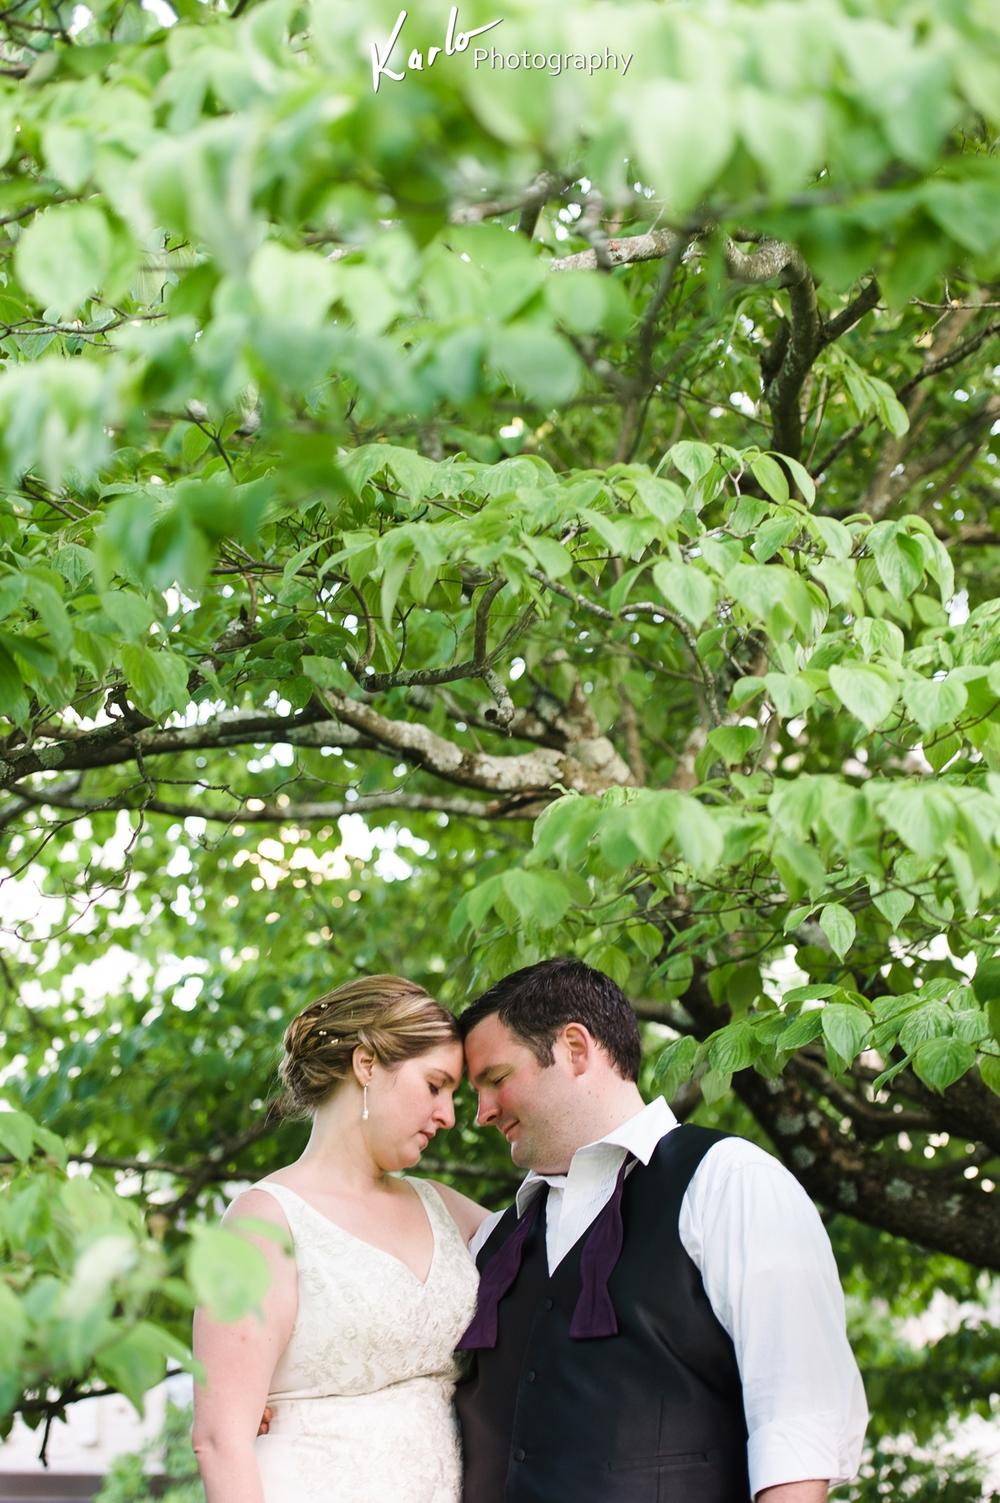 karlo wedding photographer malvern hilltop house devon pa pennsylvania 0022.JPG